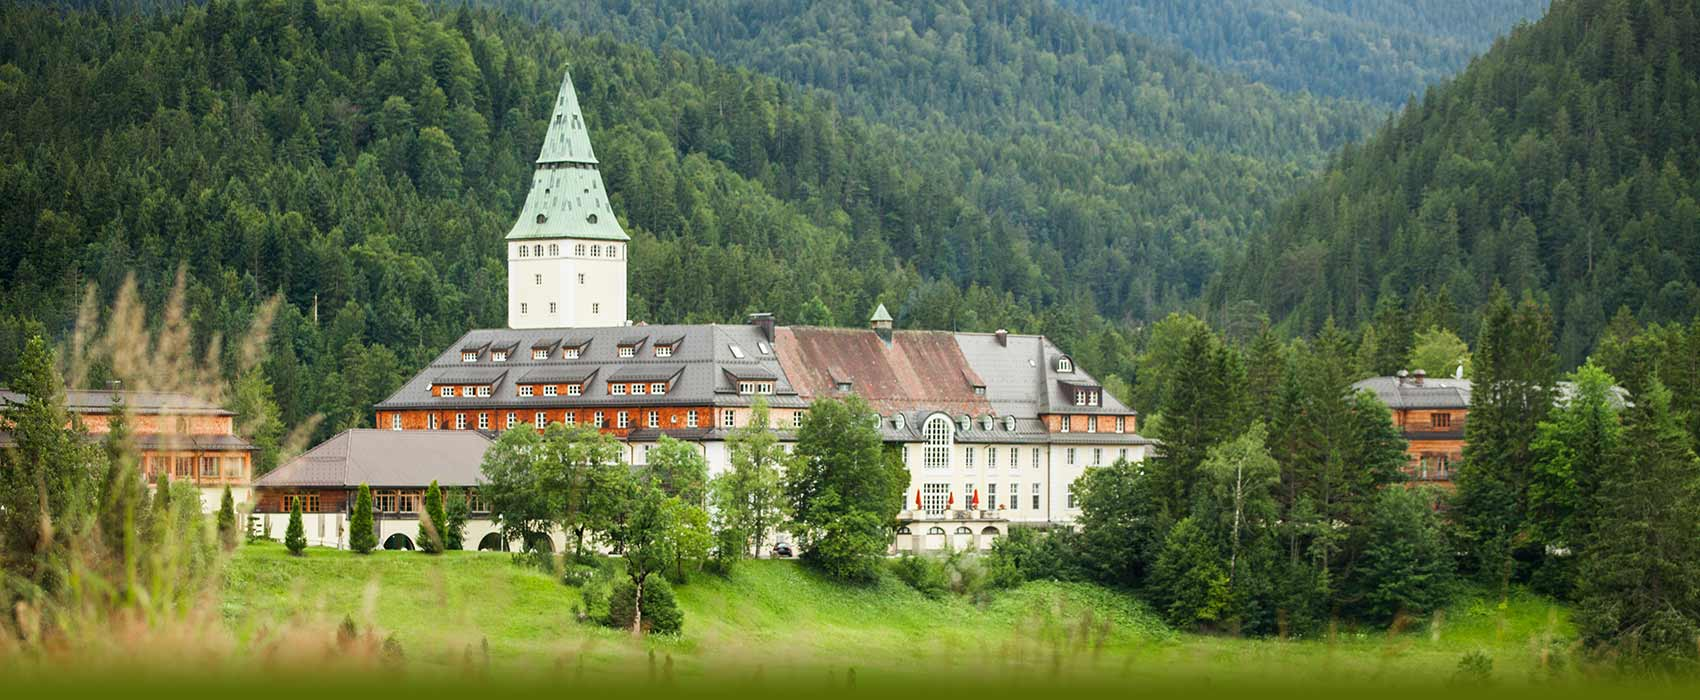 Hotels in Mittenwald, Wallgau, Krün